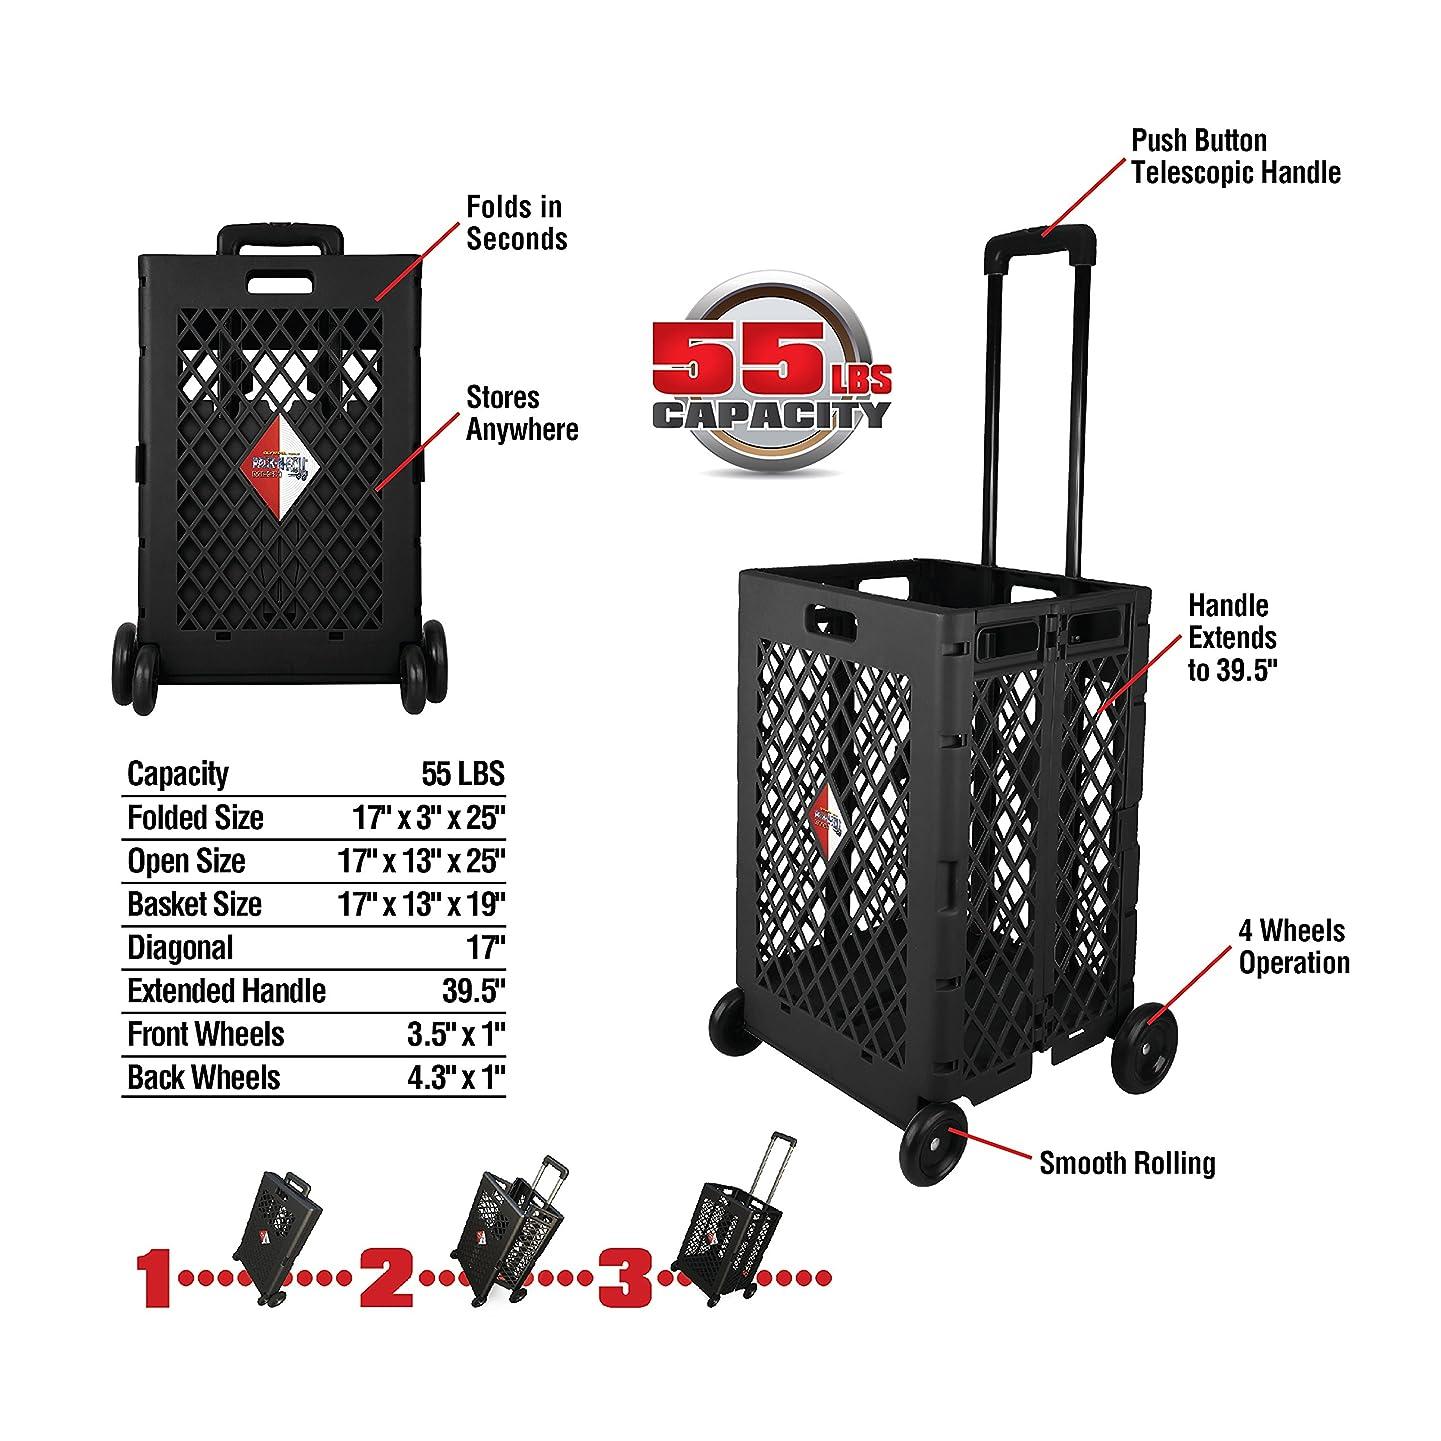 Olympia Tools 85-404 Pack-N Mesh Rolling Cart, 55 Lb, Plastic, 55LB, Black clibmvtnbejf